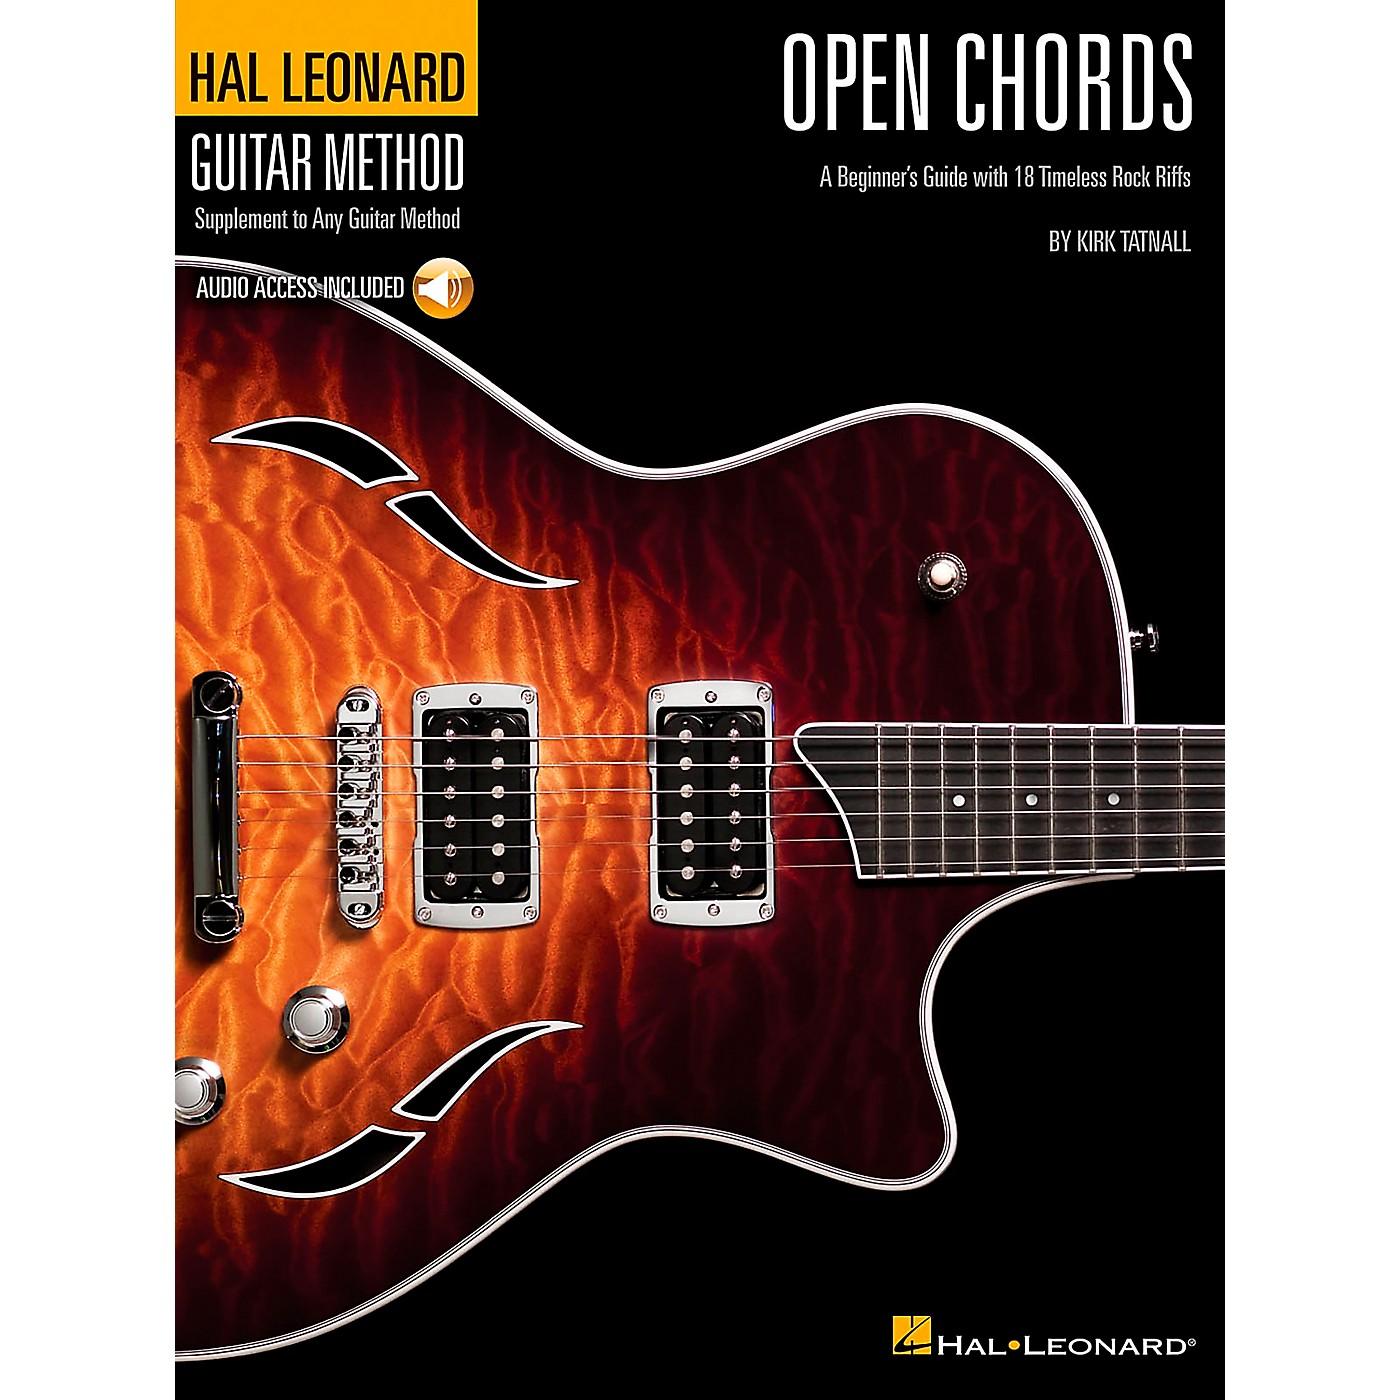 Hal Leonard Open Chords Book/CD Hal Leonard guitar Method Supplement thumbnail